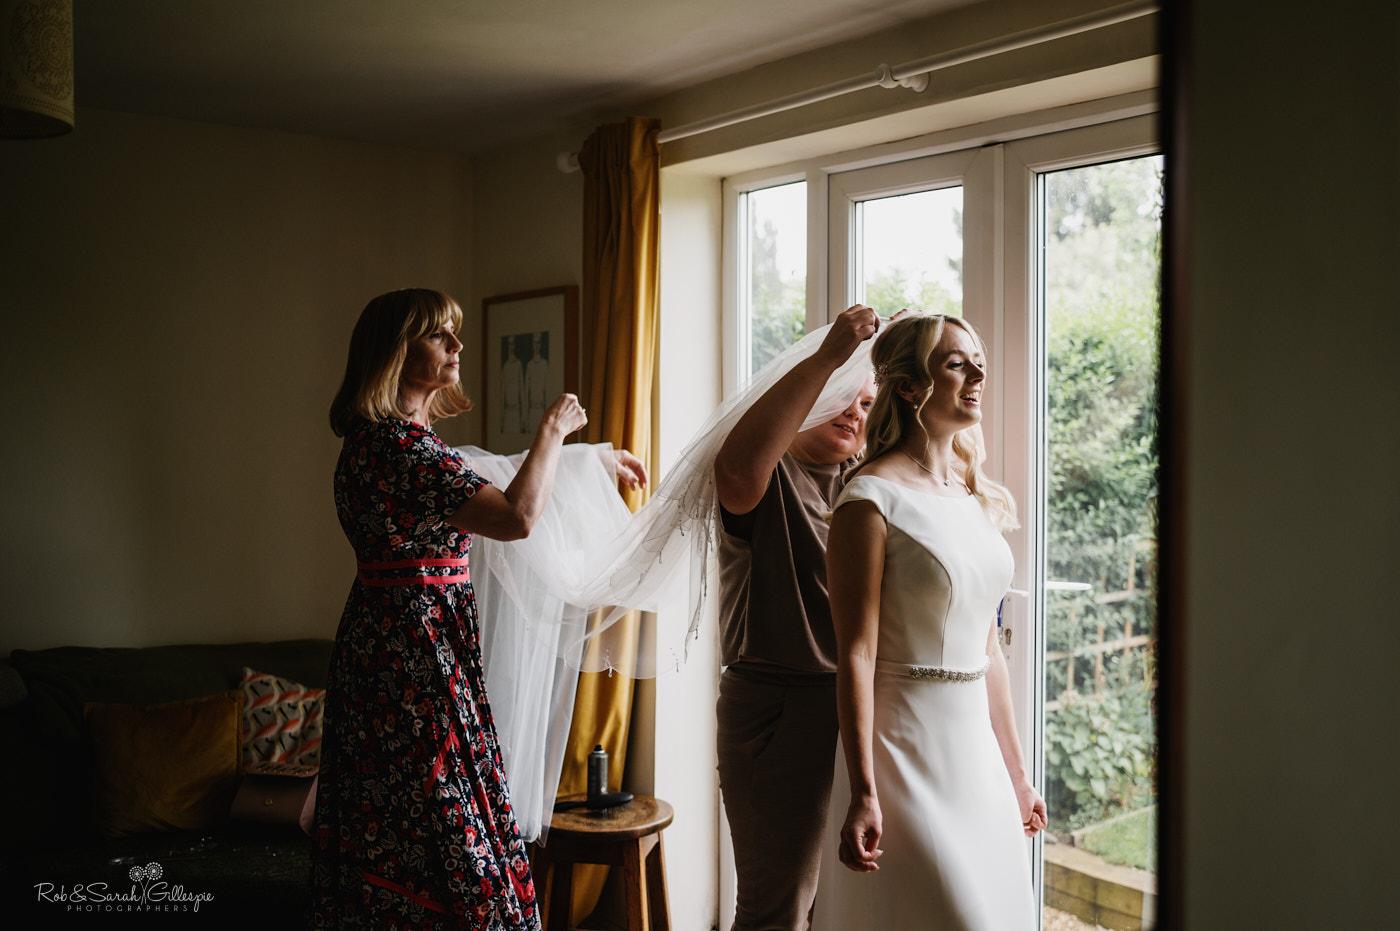 Bride has veil fixed as she prepares for wedding